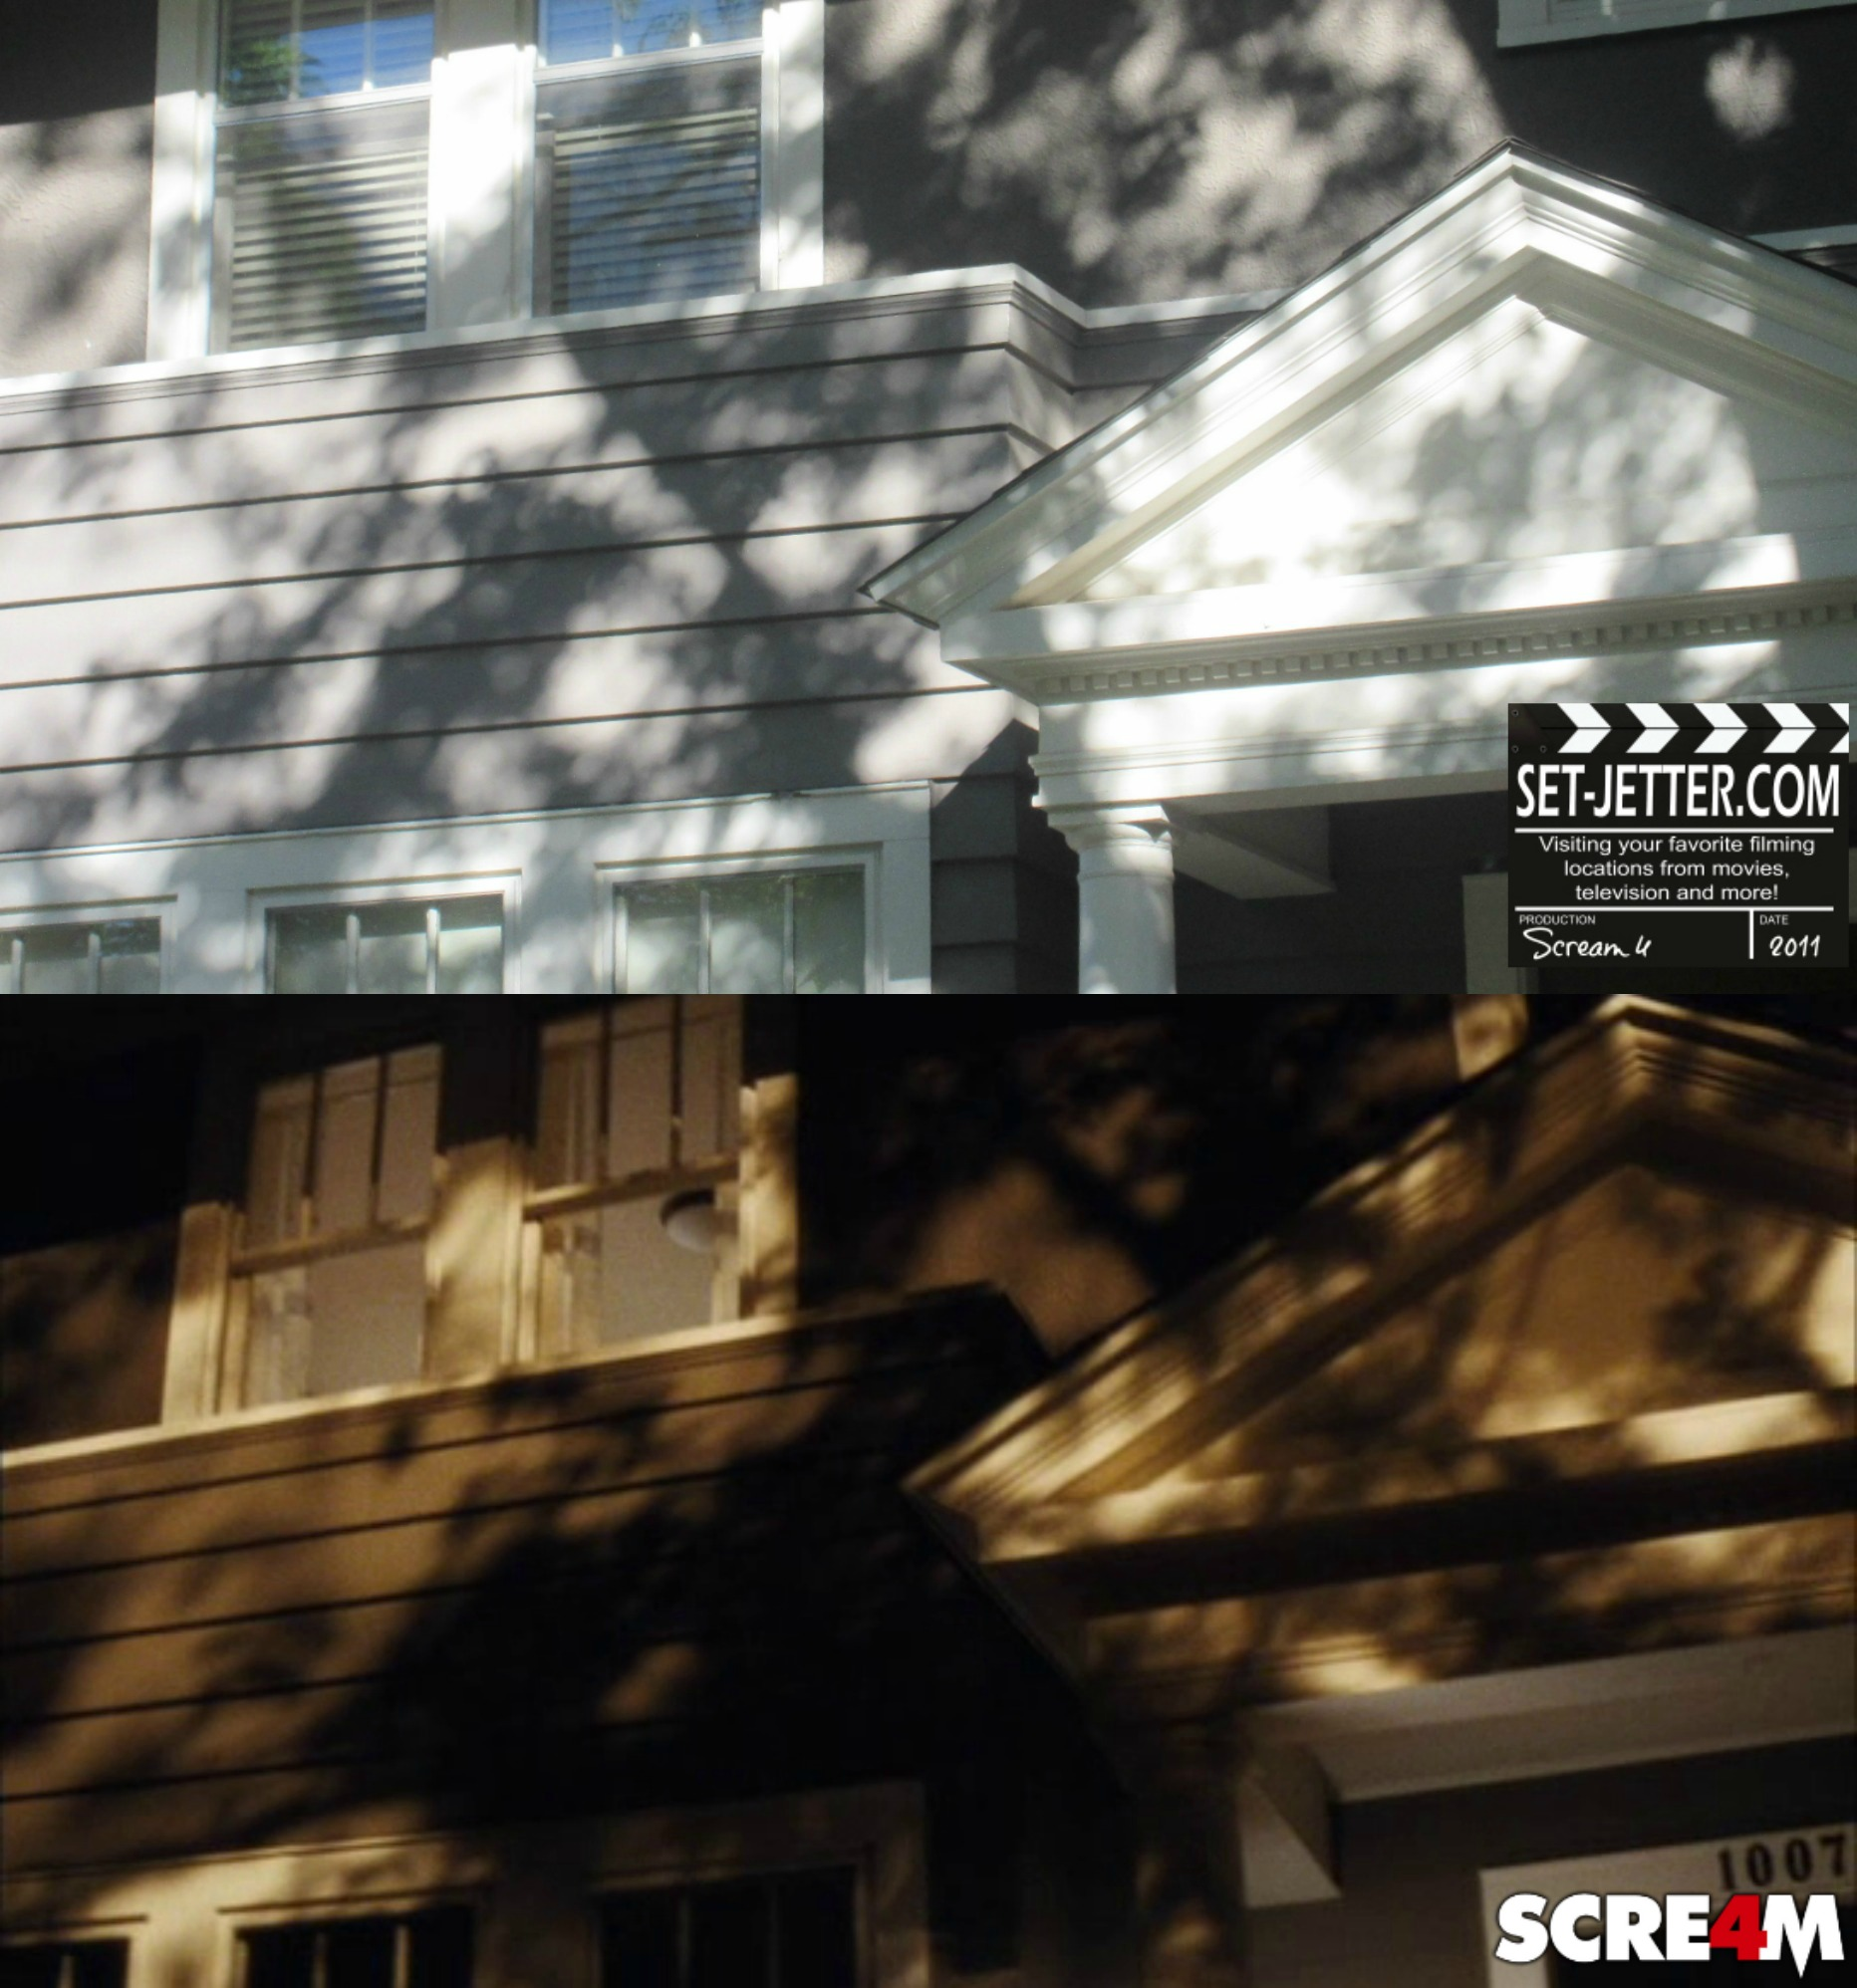 Scream4 comparison 124.jpg